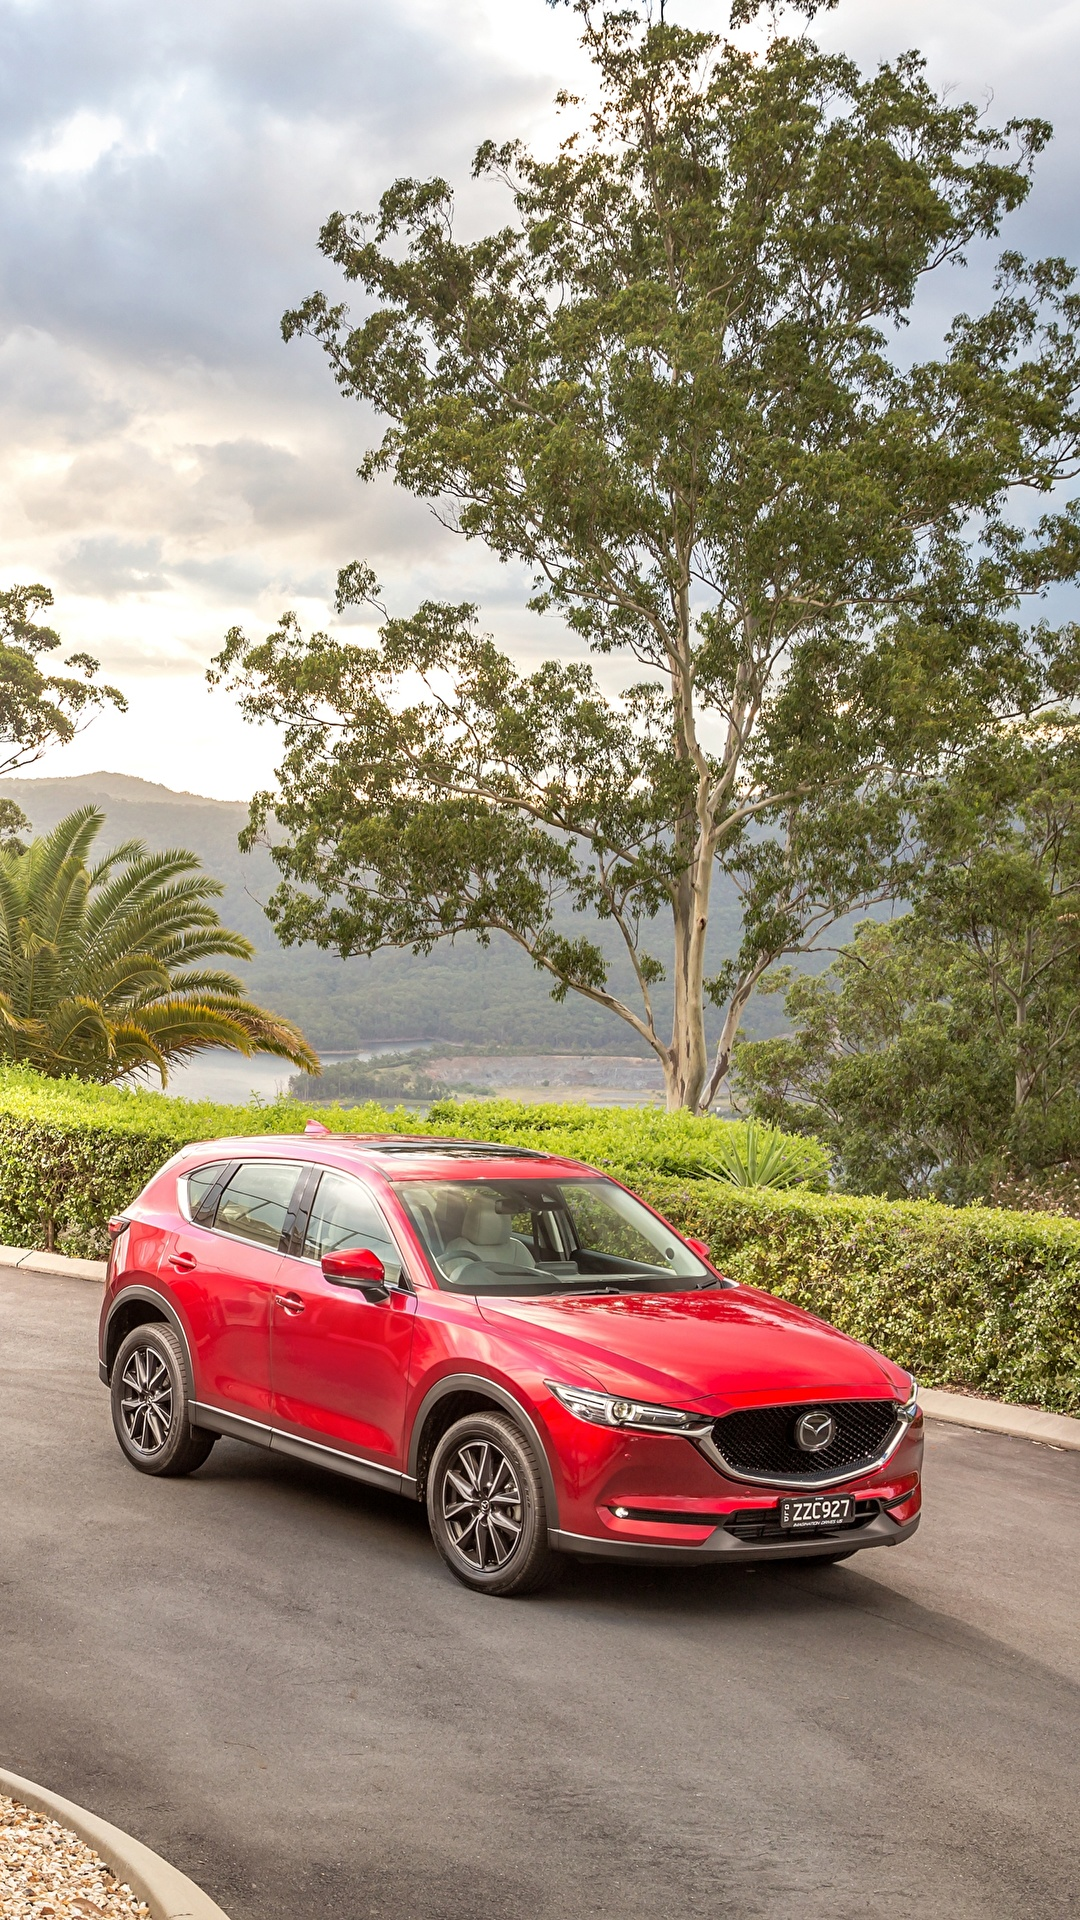 Картинка Mazda 2017 CX-5 Akera Красный Машины Металлик 1080x1920 Мазда Авто Автомобили